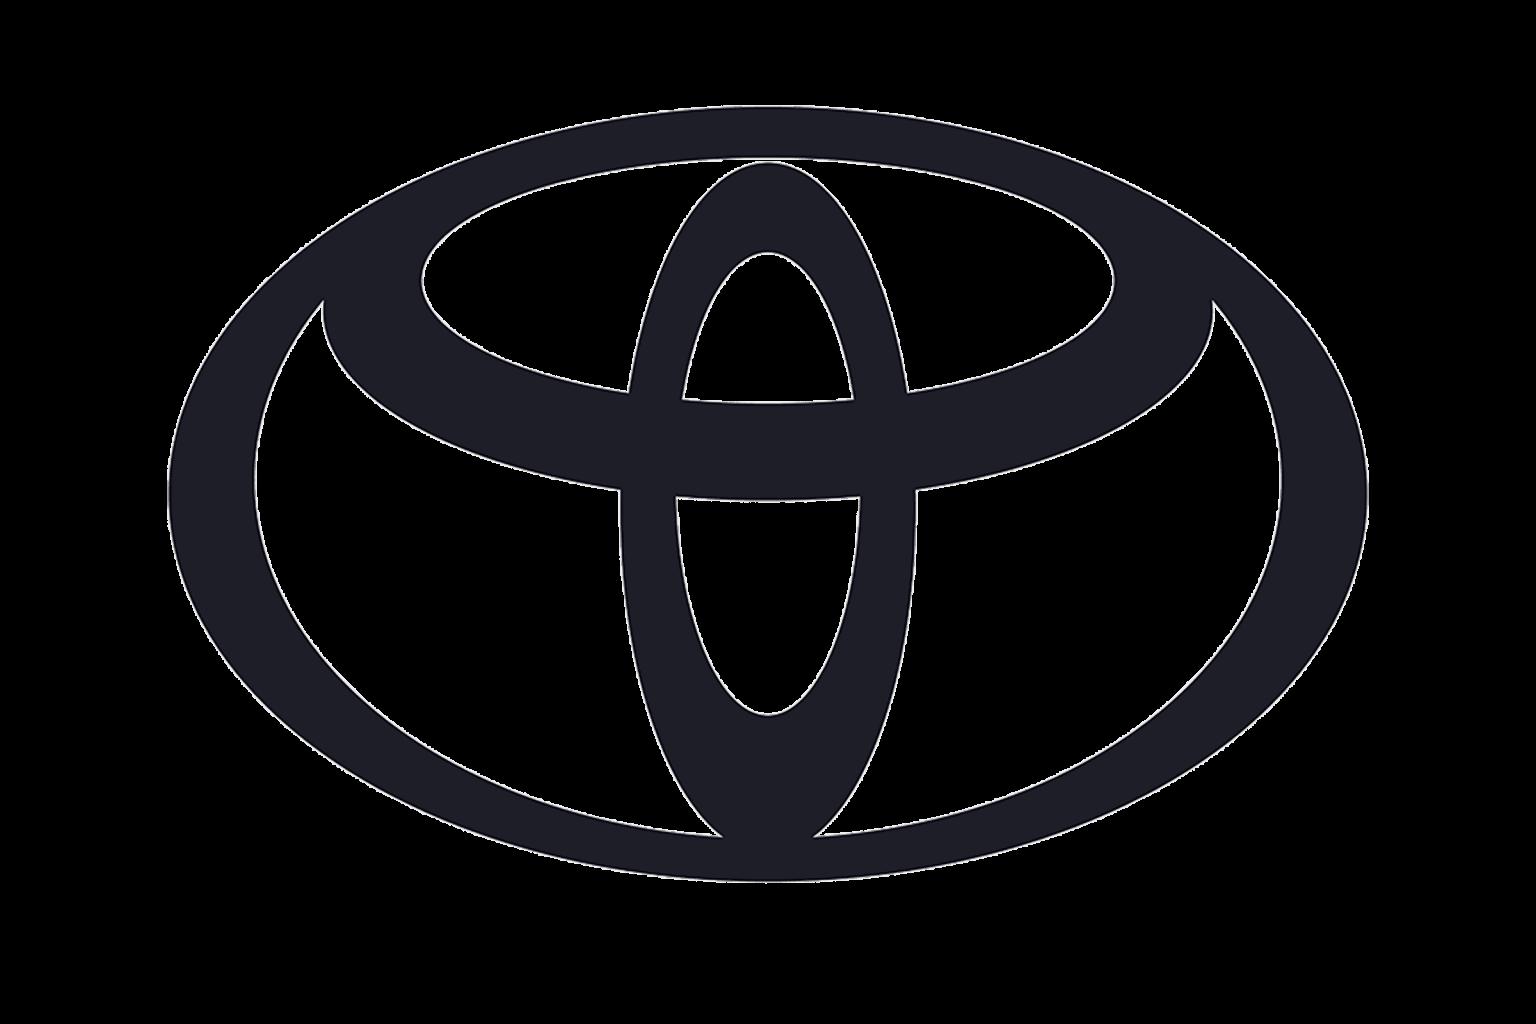 toyota-logo-2020-1536x1024